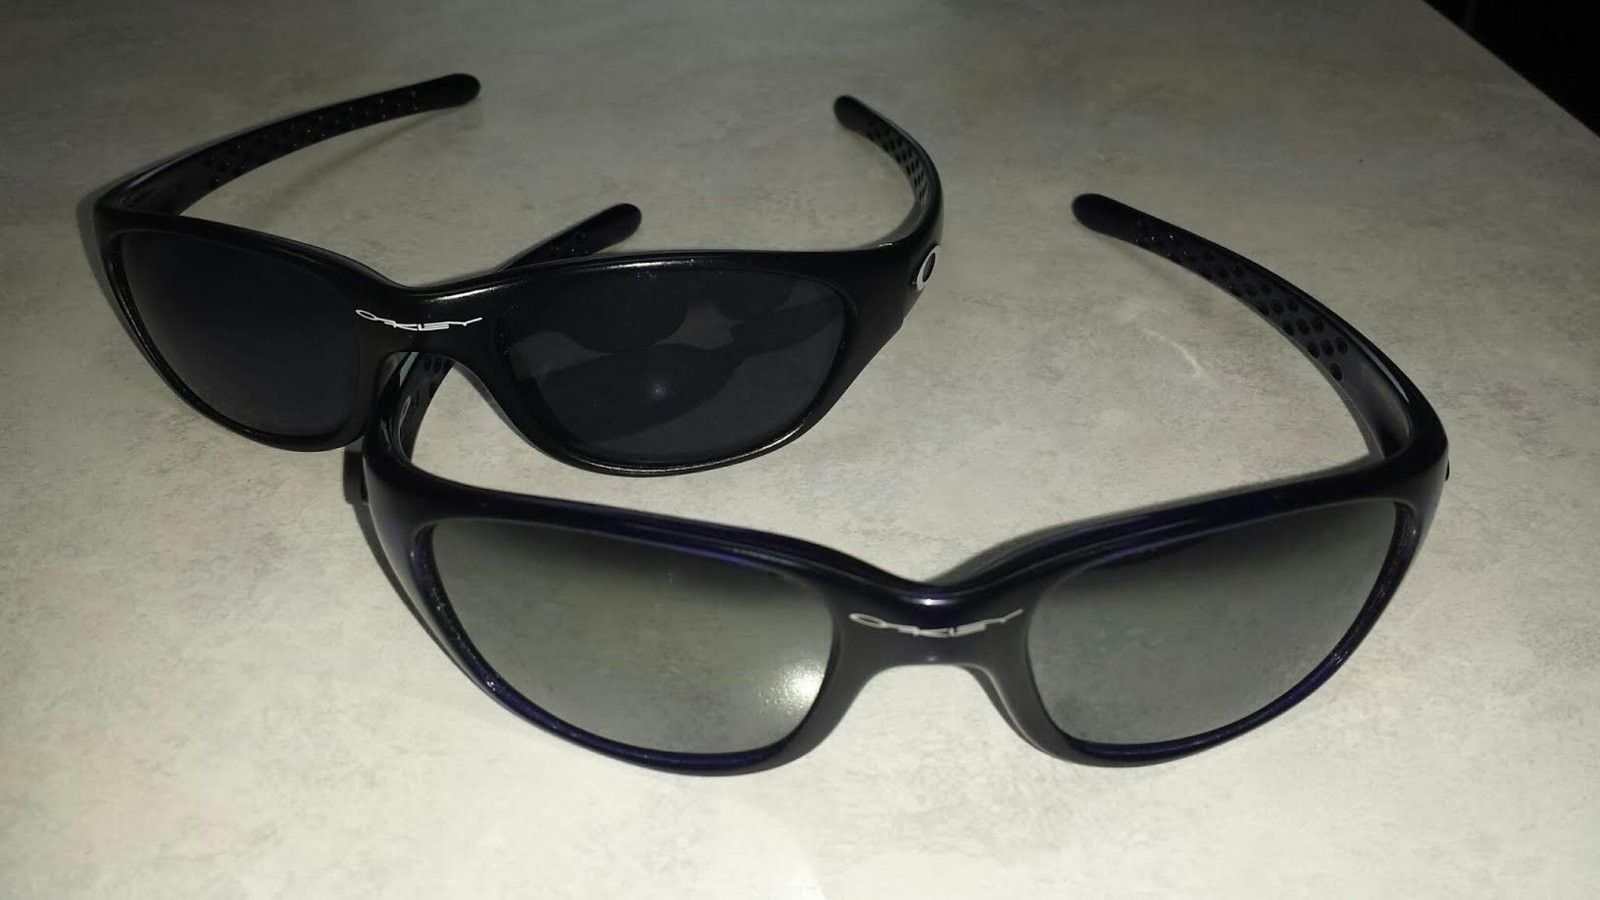 1st Generation Crystal Blue FIVES w/ Black Iridium Lenses - unnamed (35).jpg